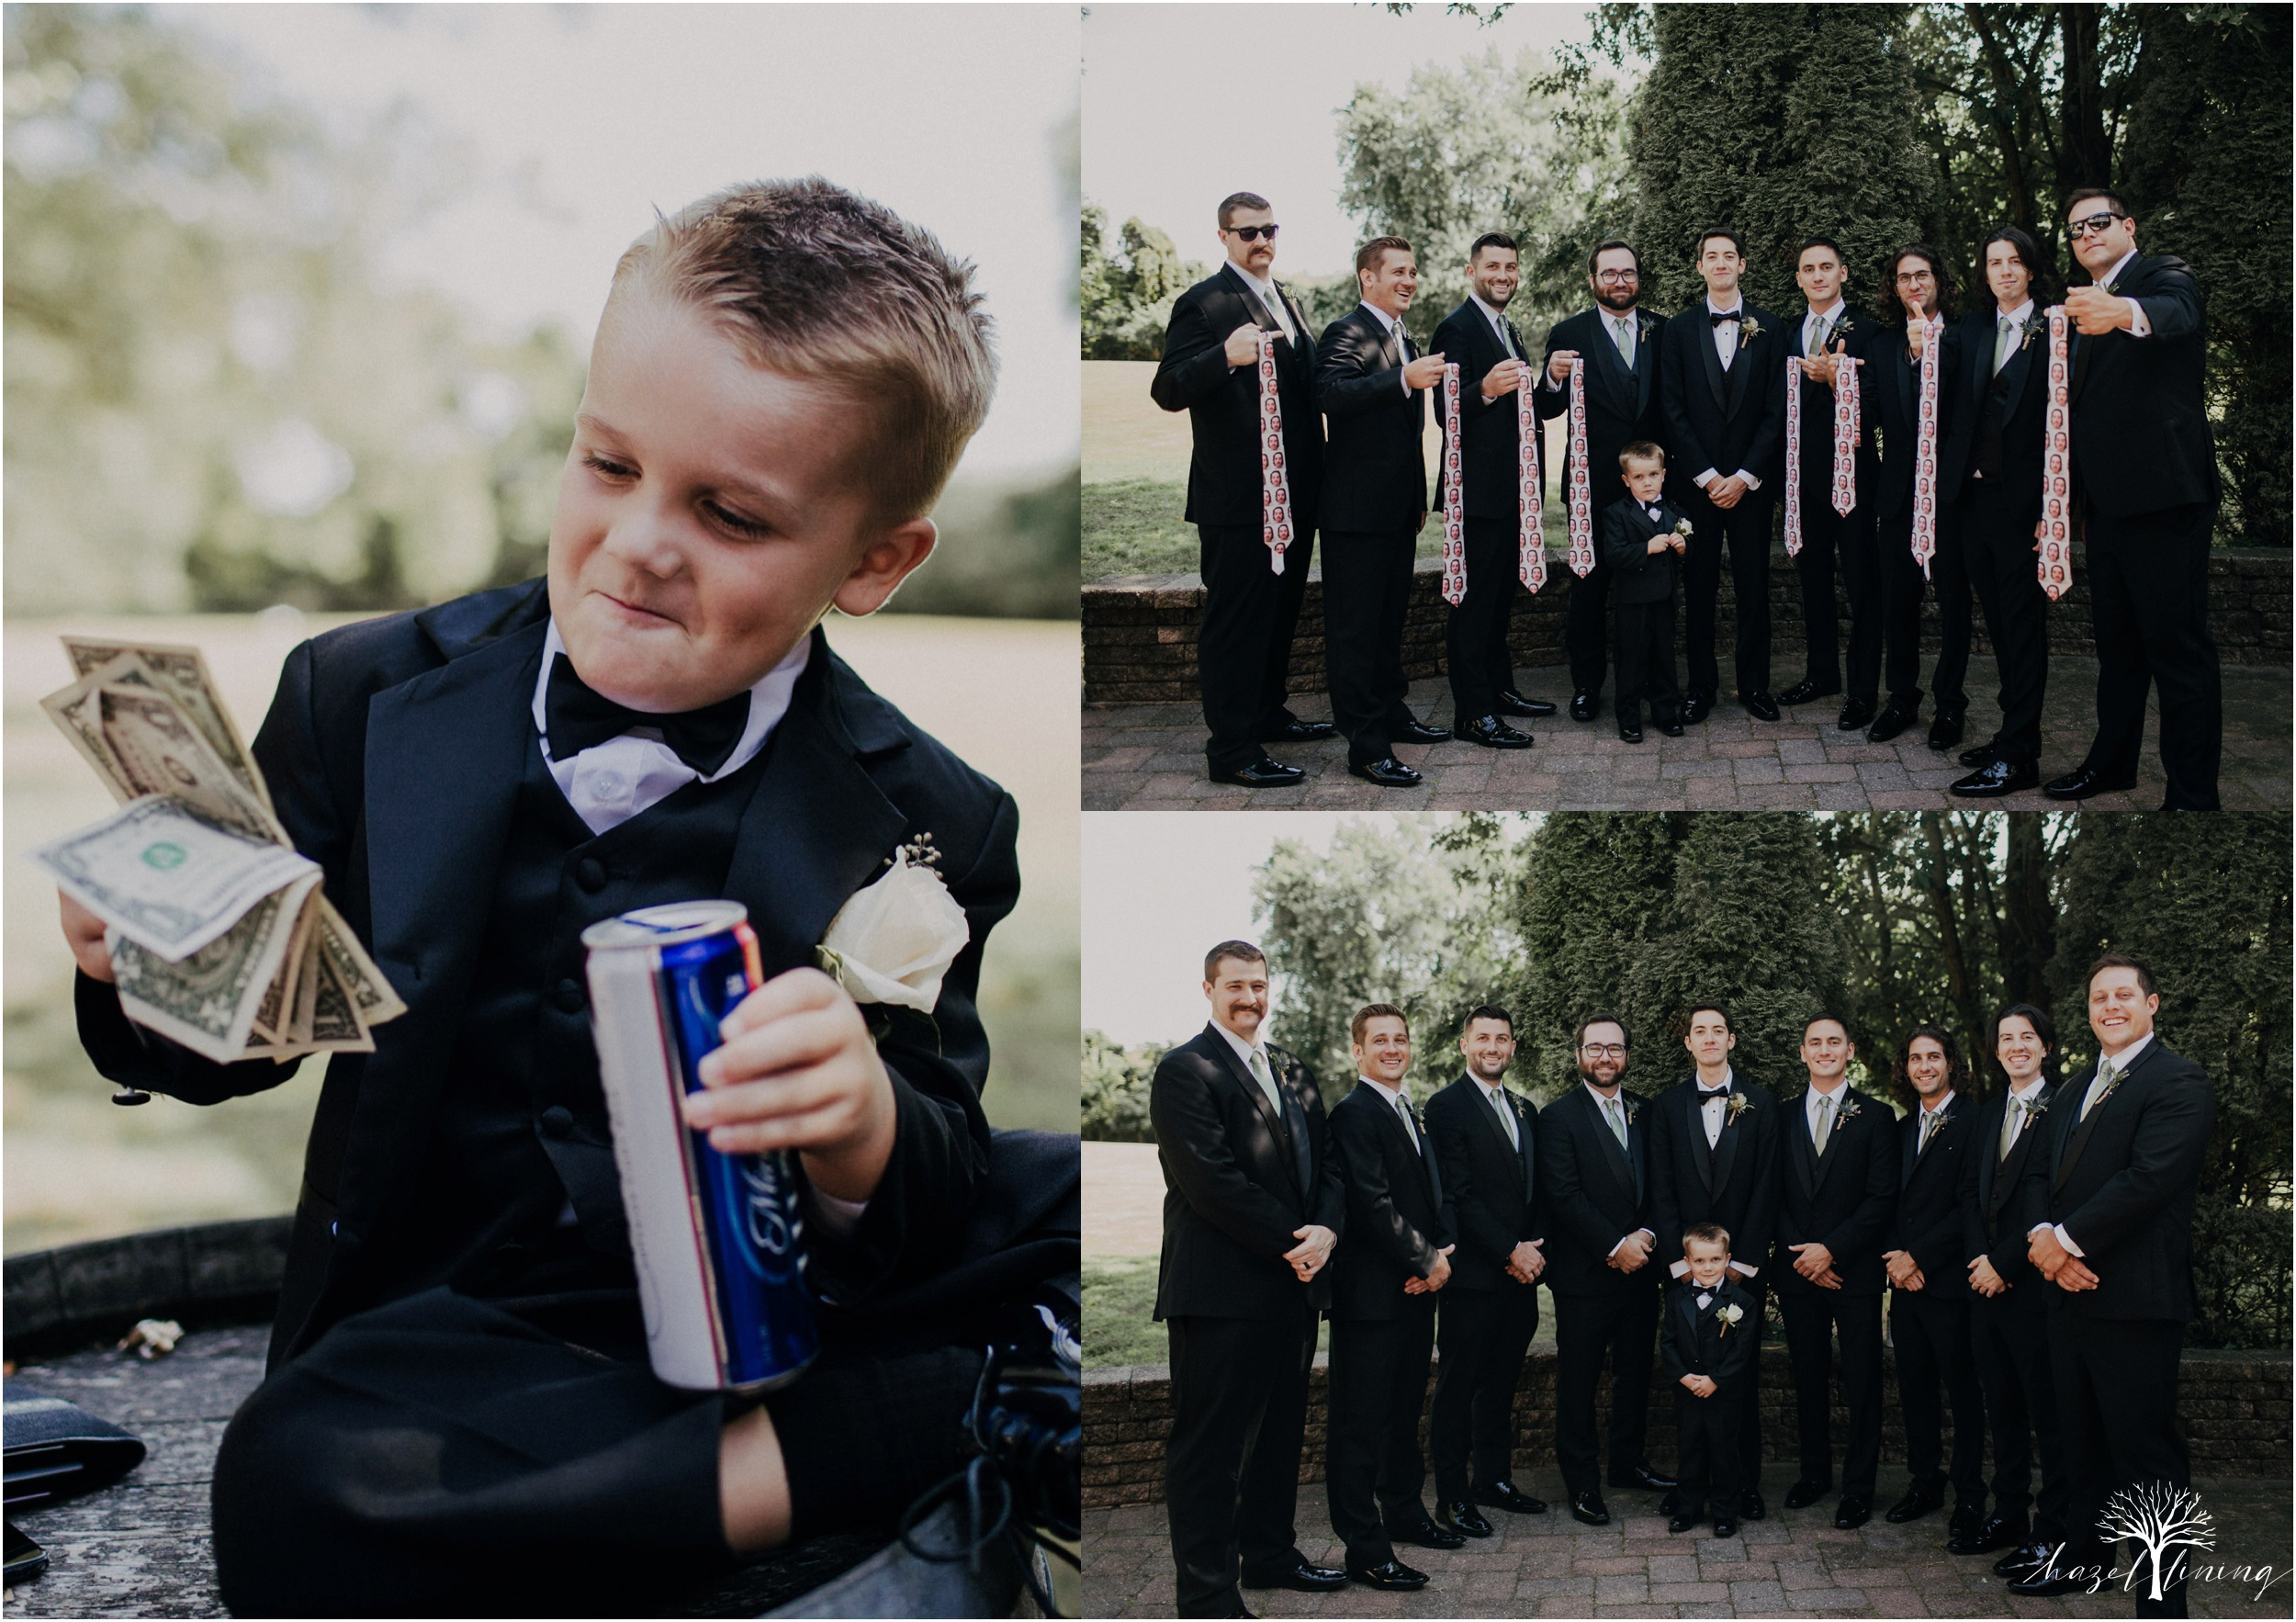 maureen-hepner-anthony-giordano-rose-bank-winery-newtow-pennsylvania-luxury-summer-wedding-hazel-lining-photography-destination-elopement-wedding-engagement-photography_0048.jpg